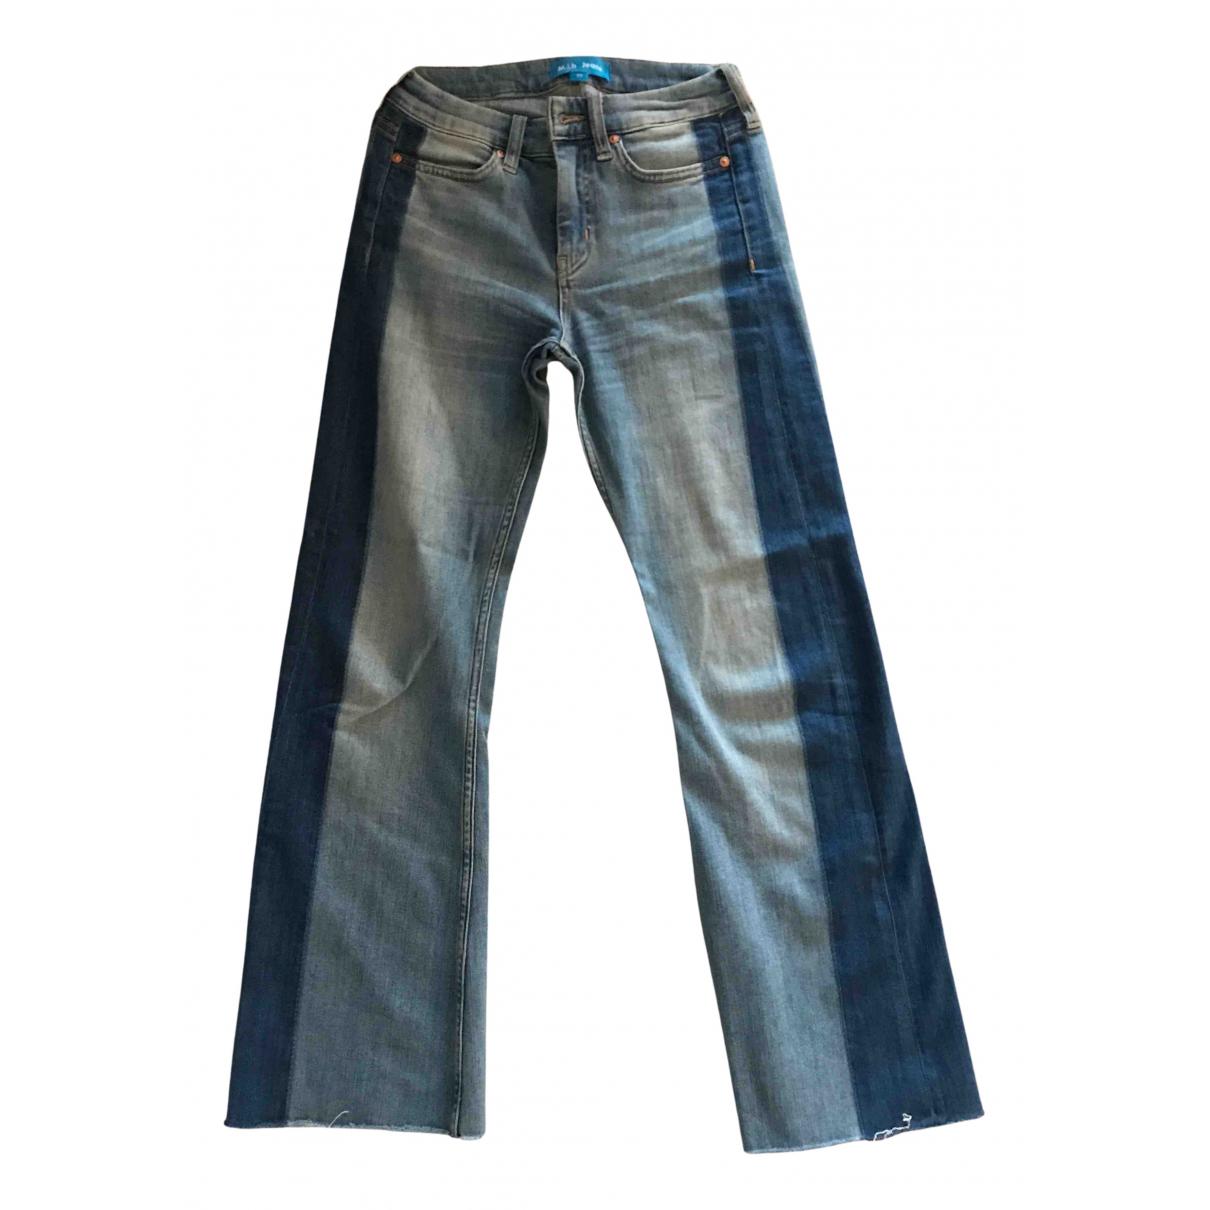 Vaquero Mih Jeans